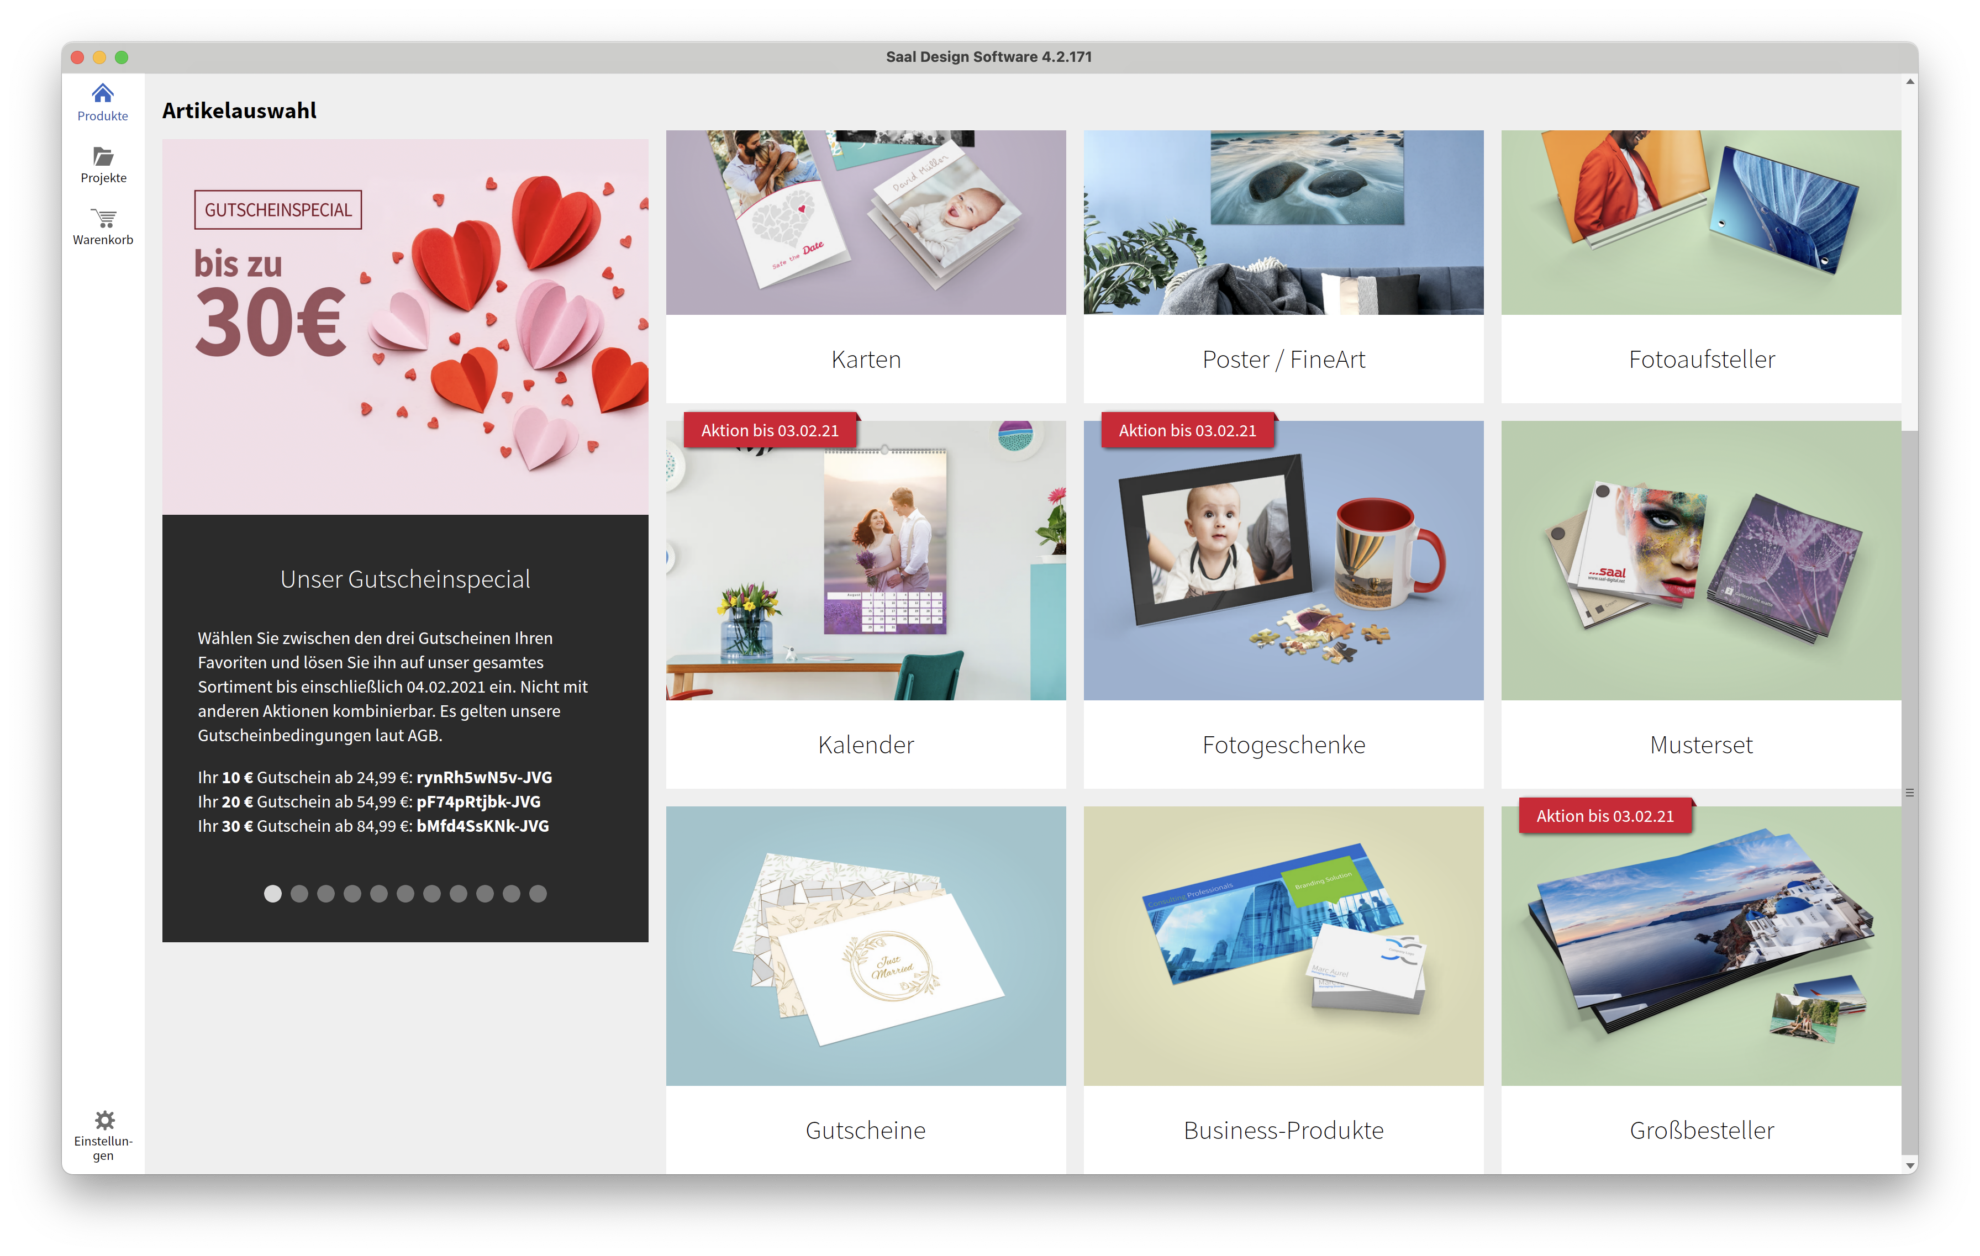 SaalDigital Software Startseite